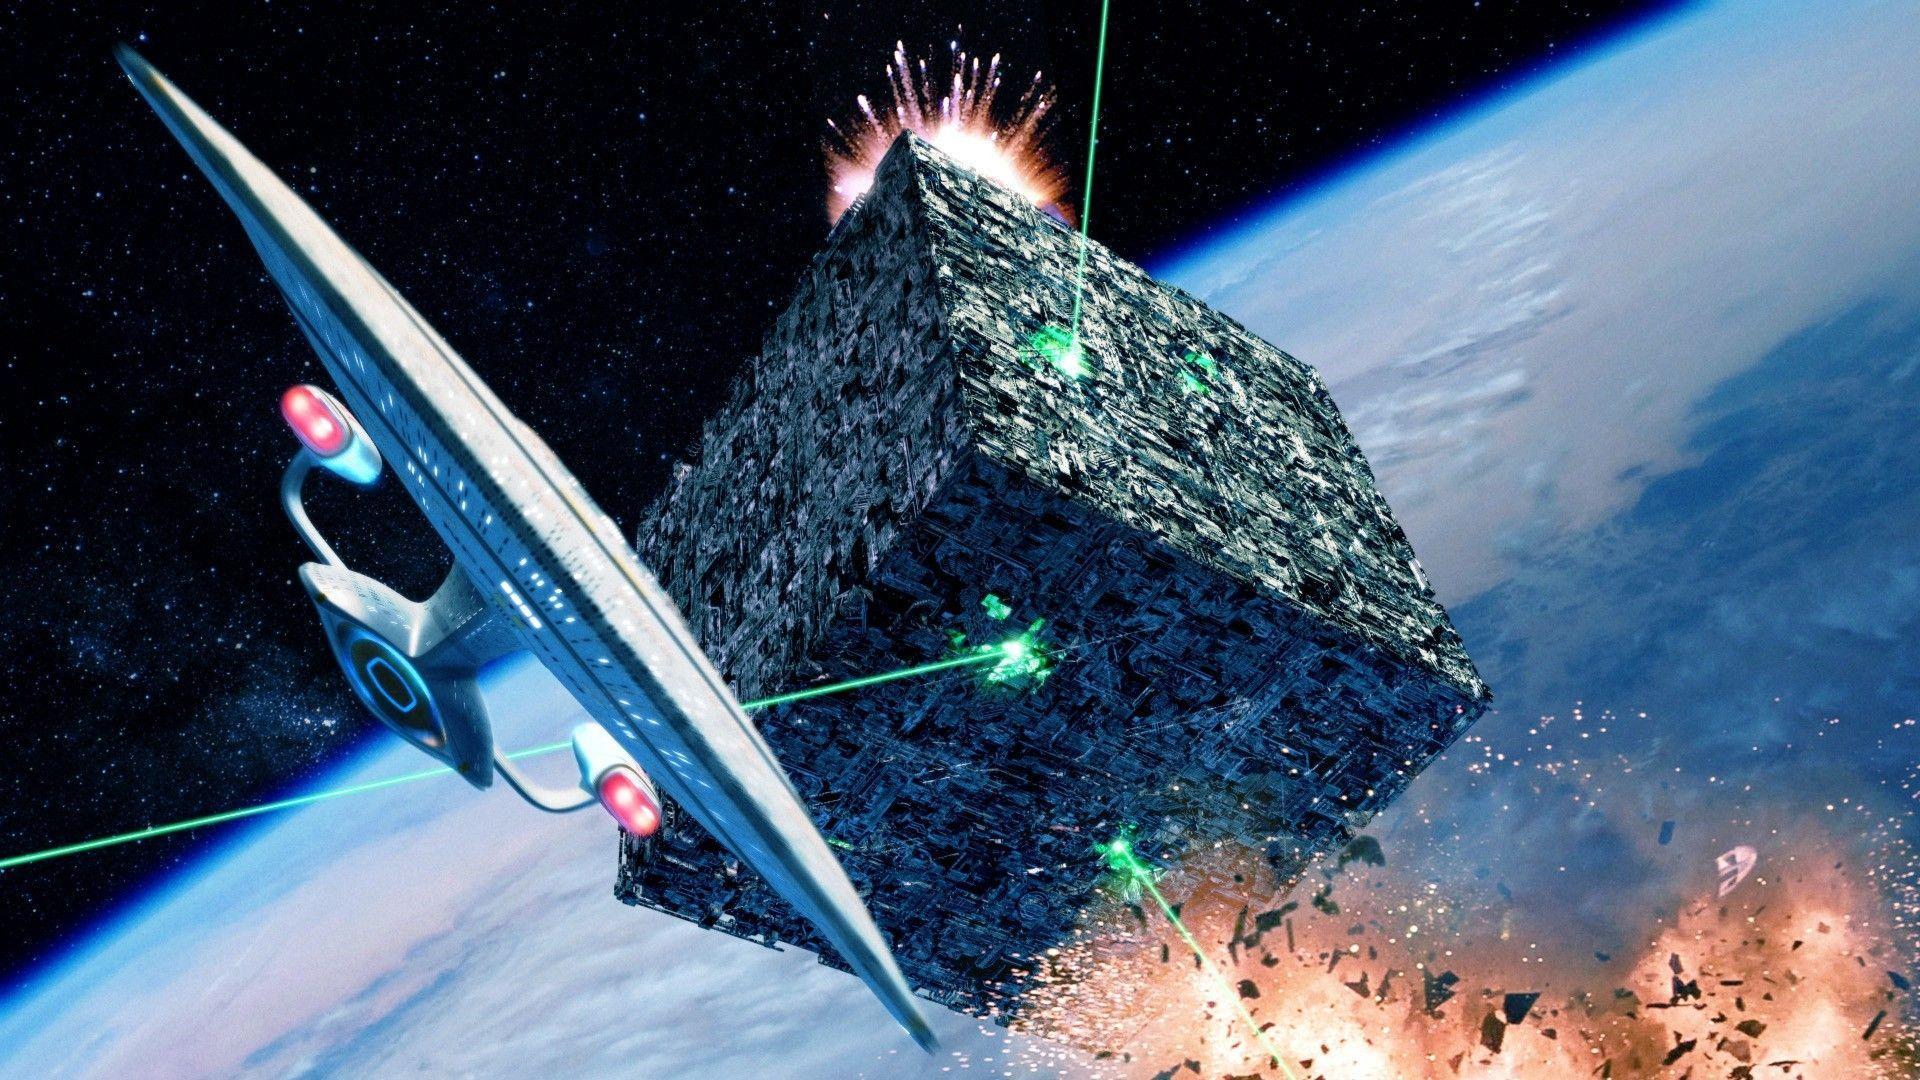 Star Trek Wallpapers Top Free Star Trek Backgrounds